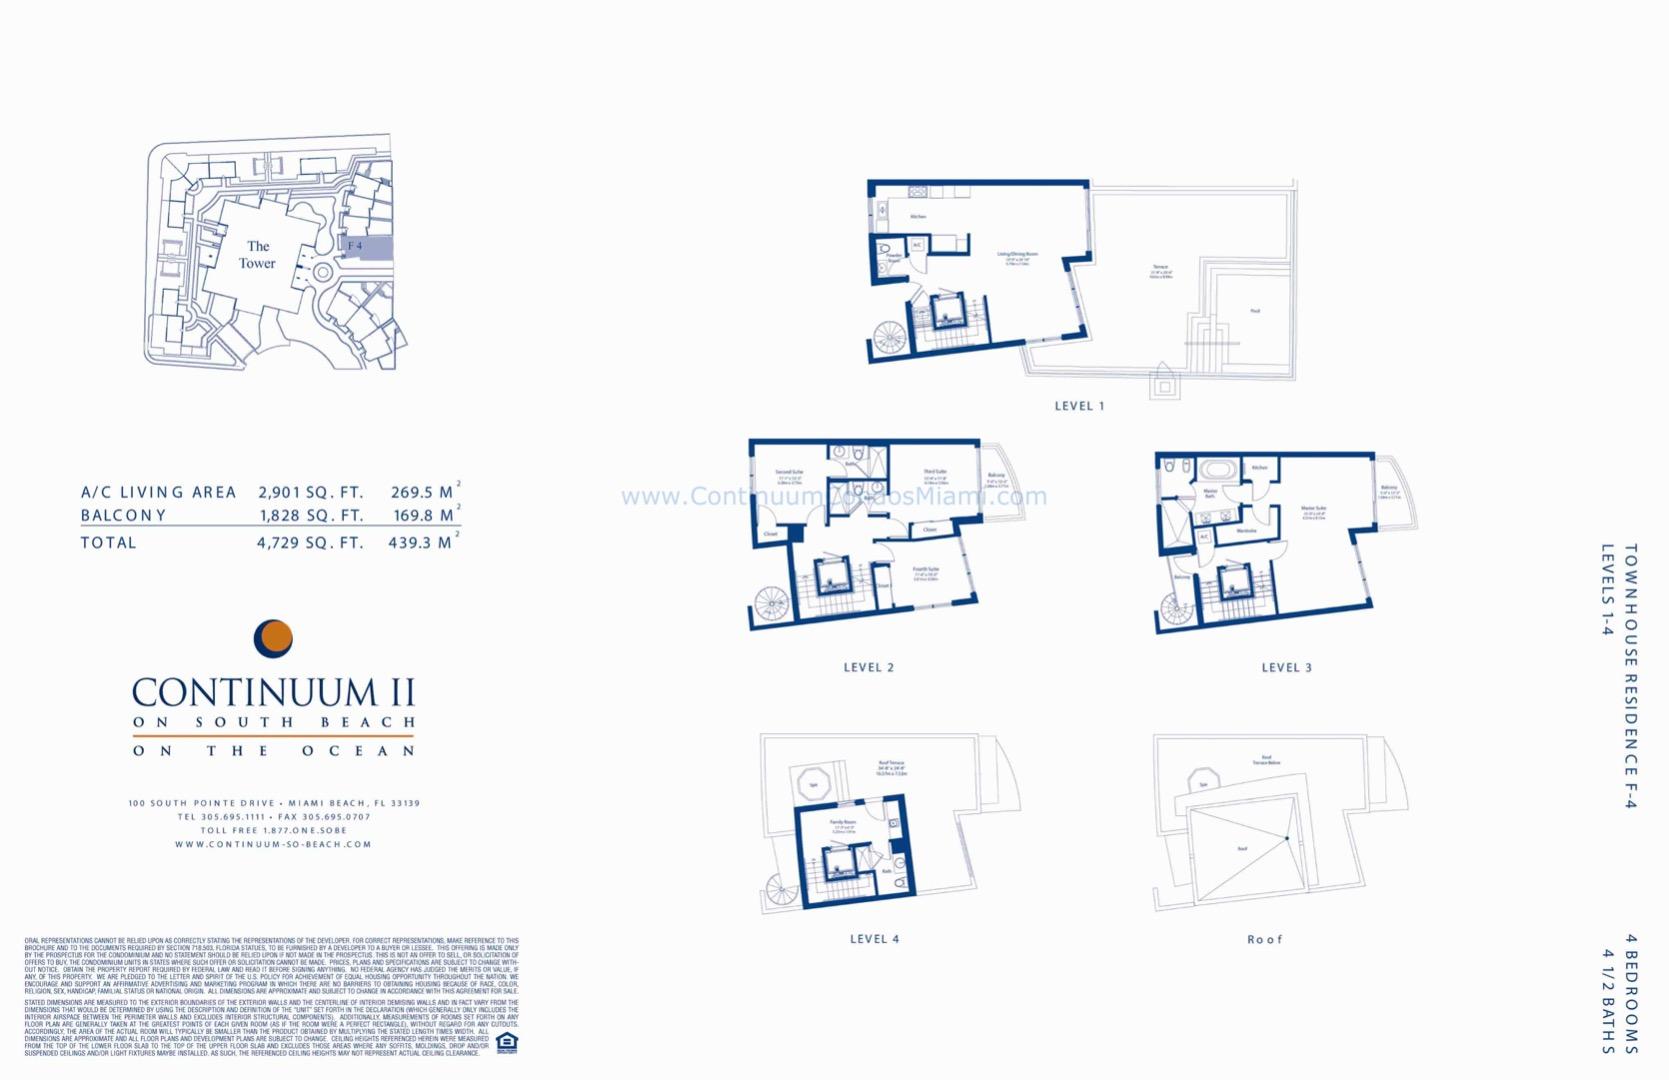 Floor plan image TH4 - 4/4/1  - 4729 sqft image